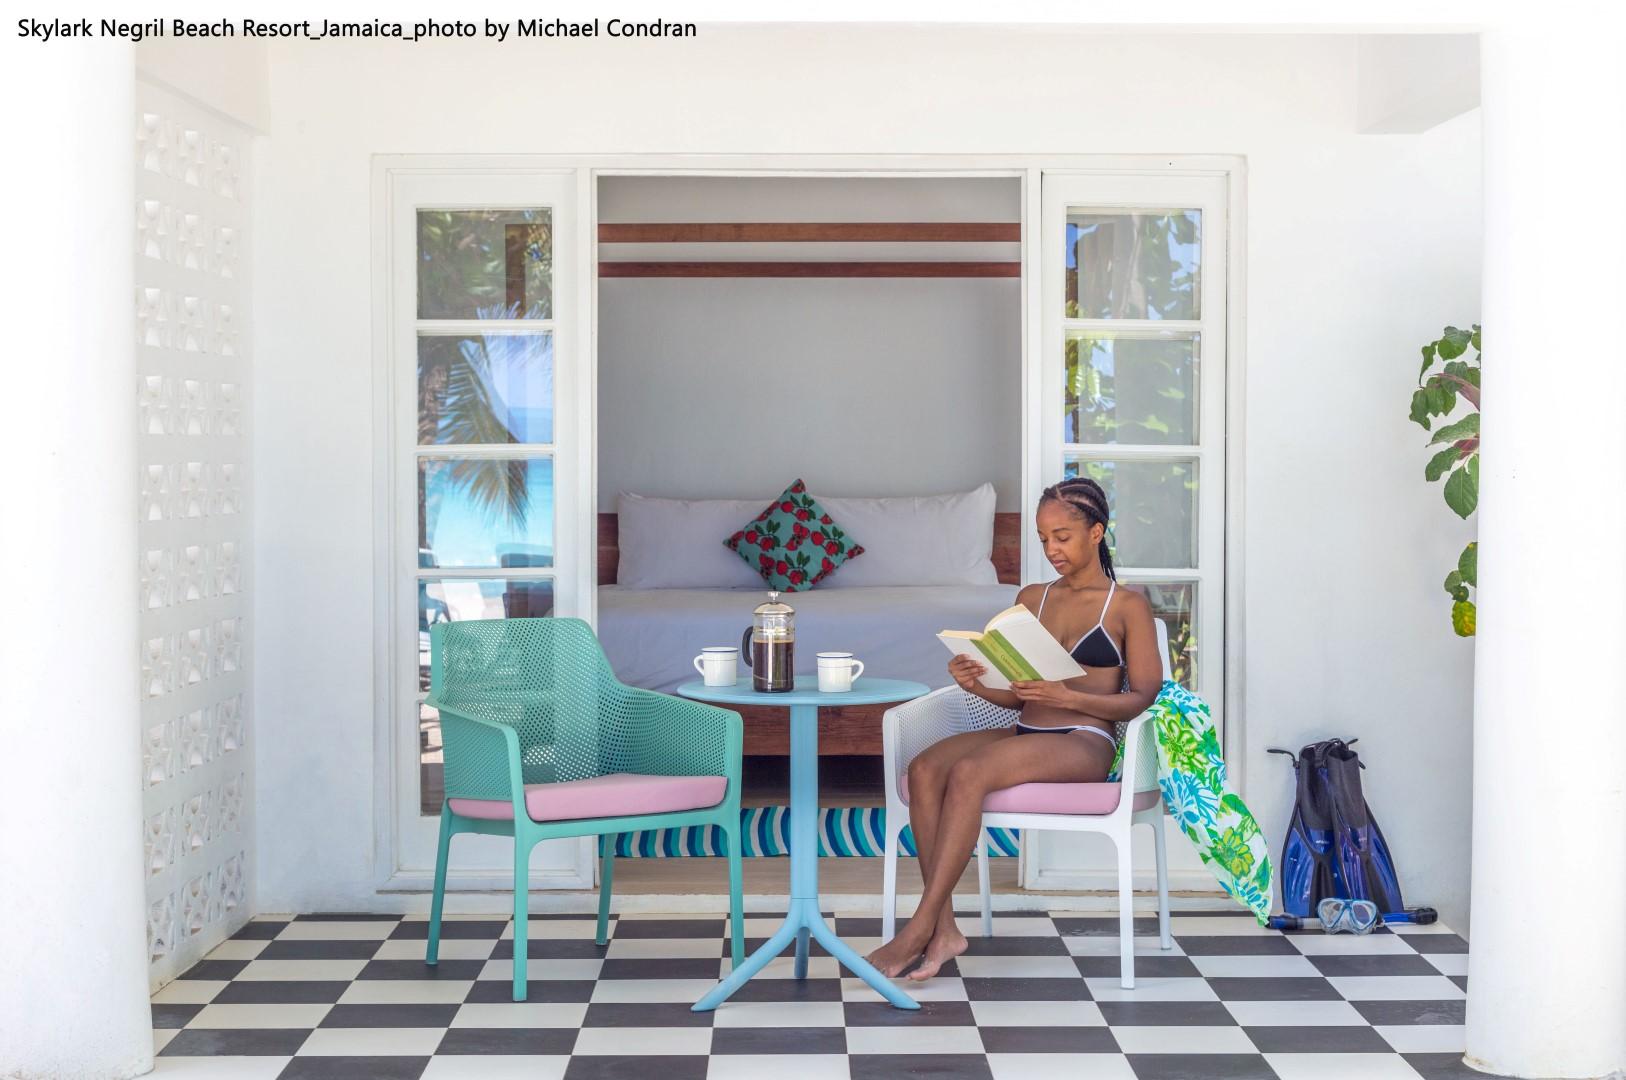 Skylark Negril Beach Resort Giamaica